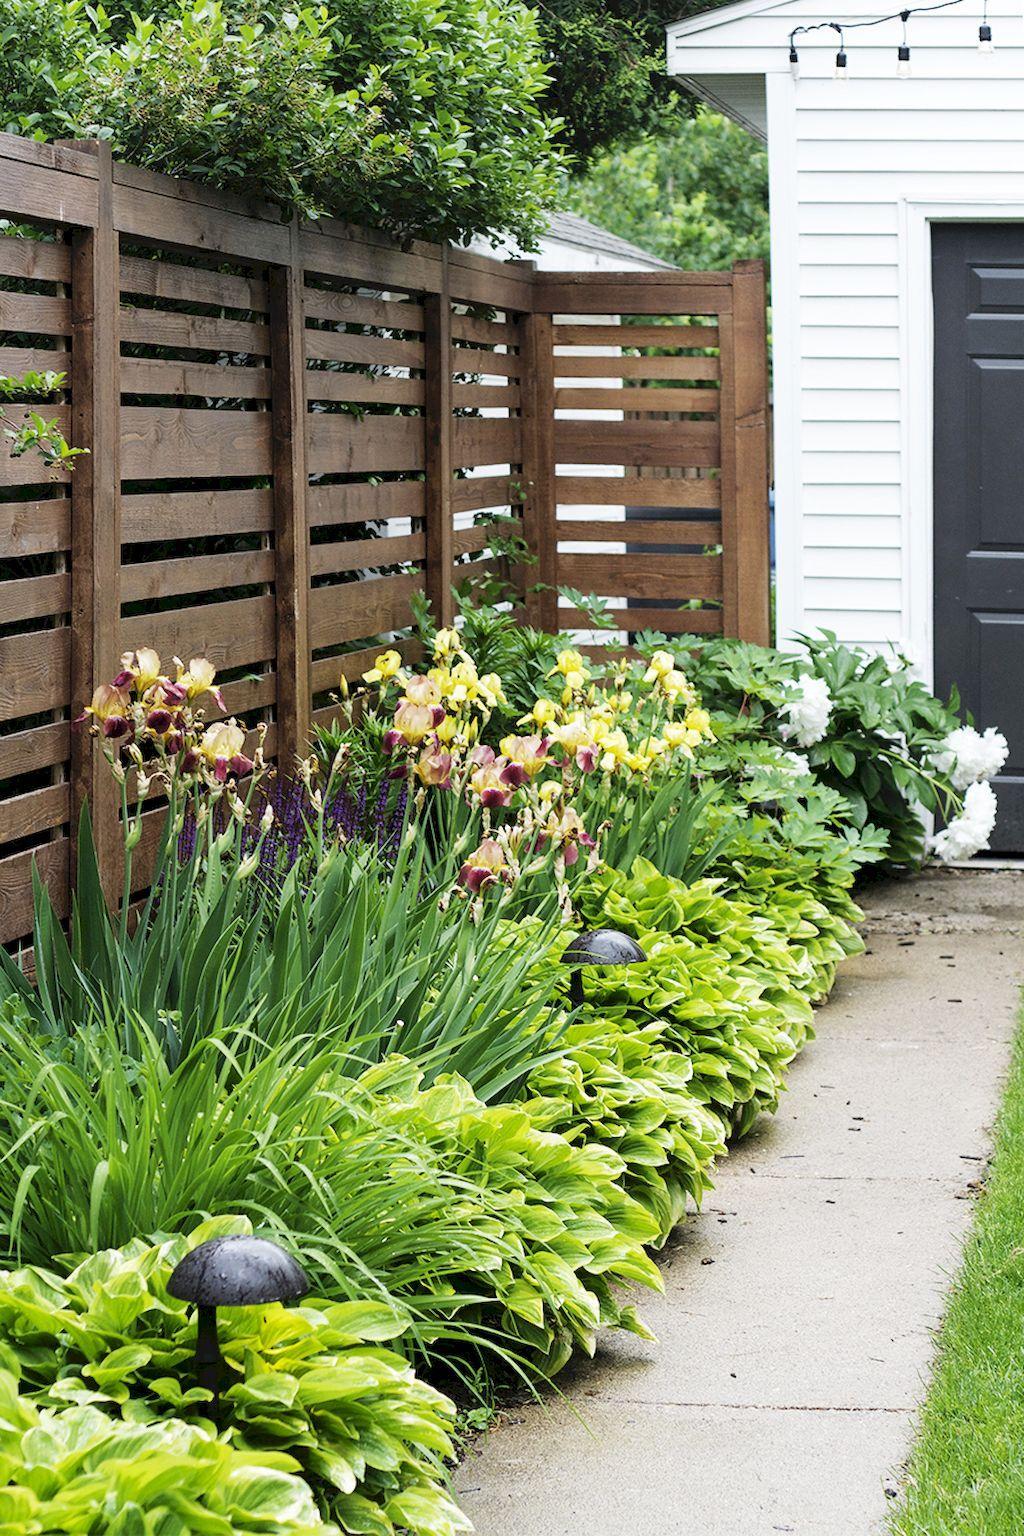 30+ Inexpensive but Innovative Backyard Garden Landscaping ... on Inexpensive Backyard Landscaping id=77929